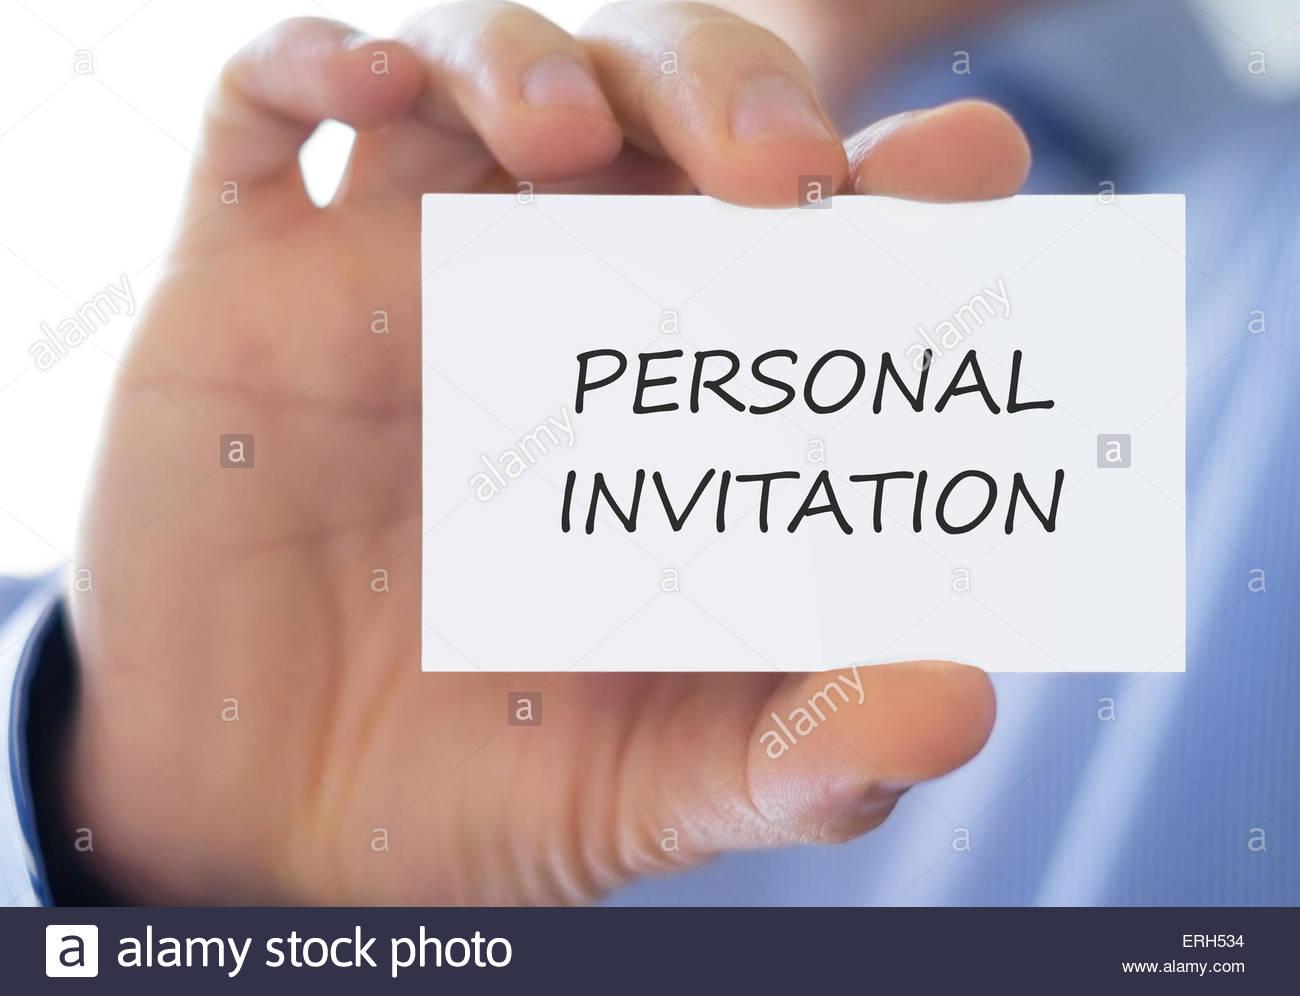 Personal Invitation - Stock Image